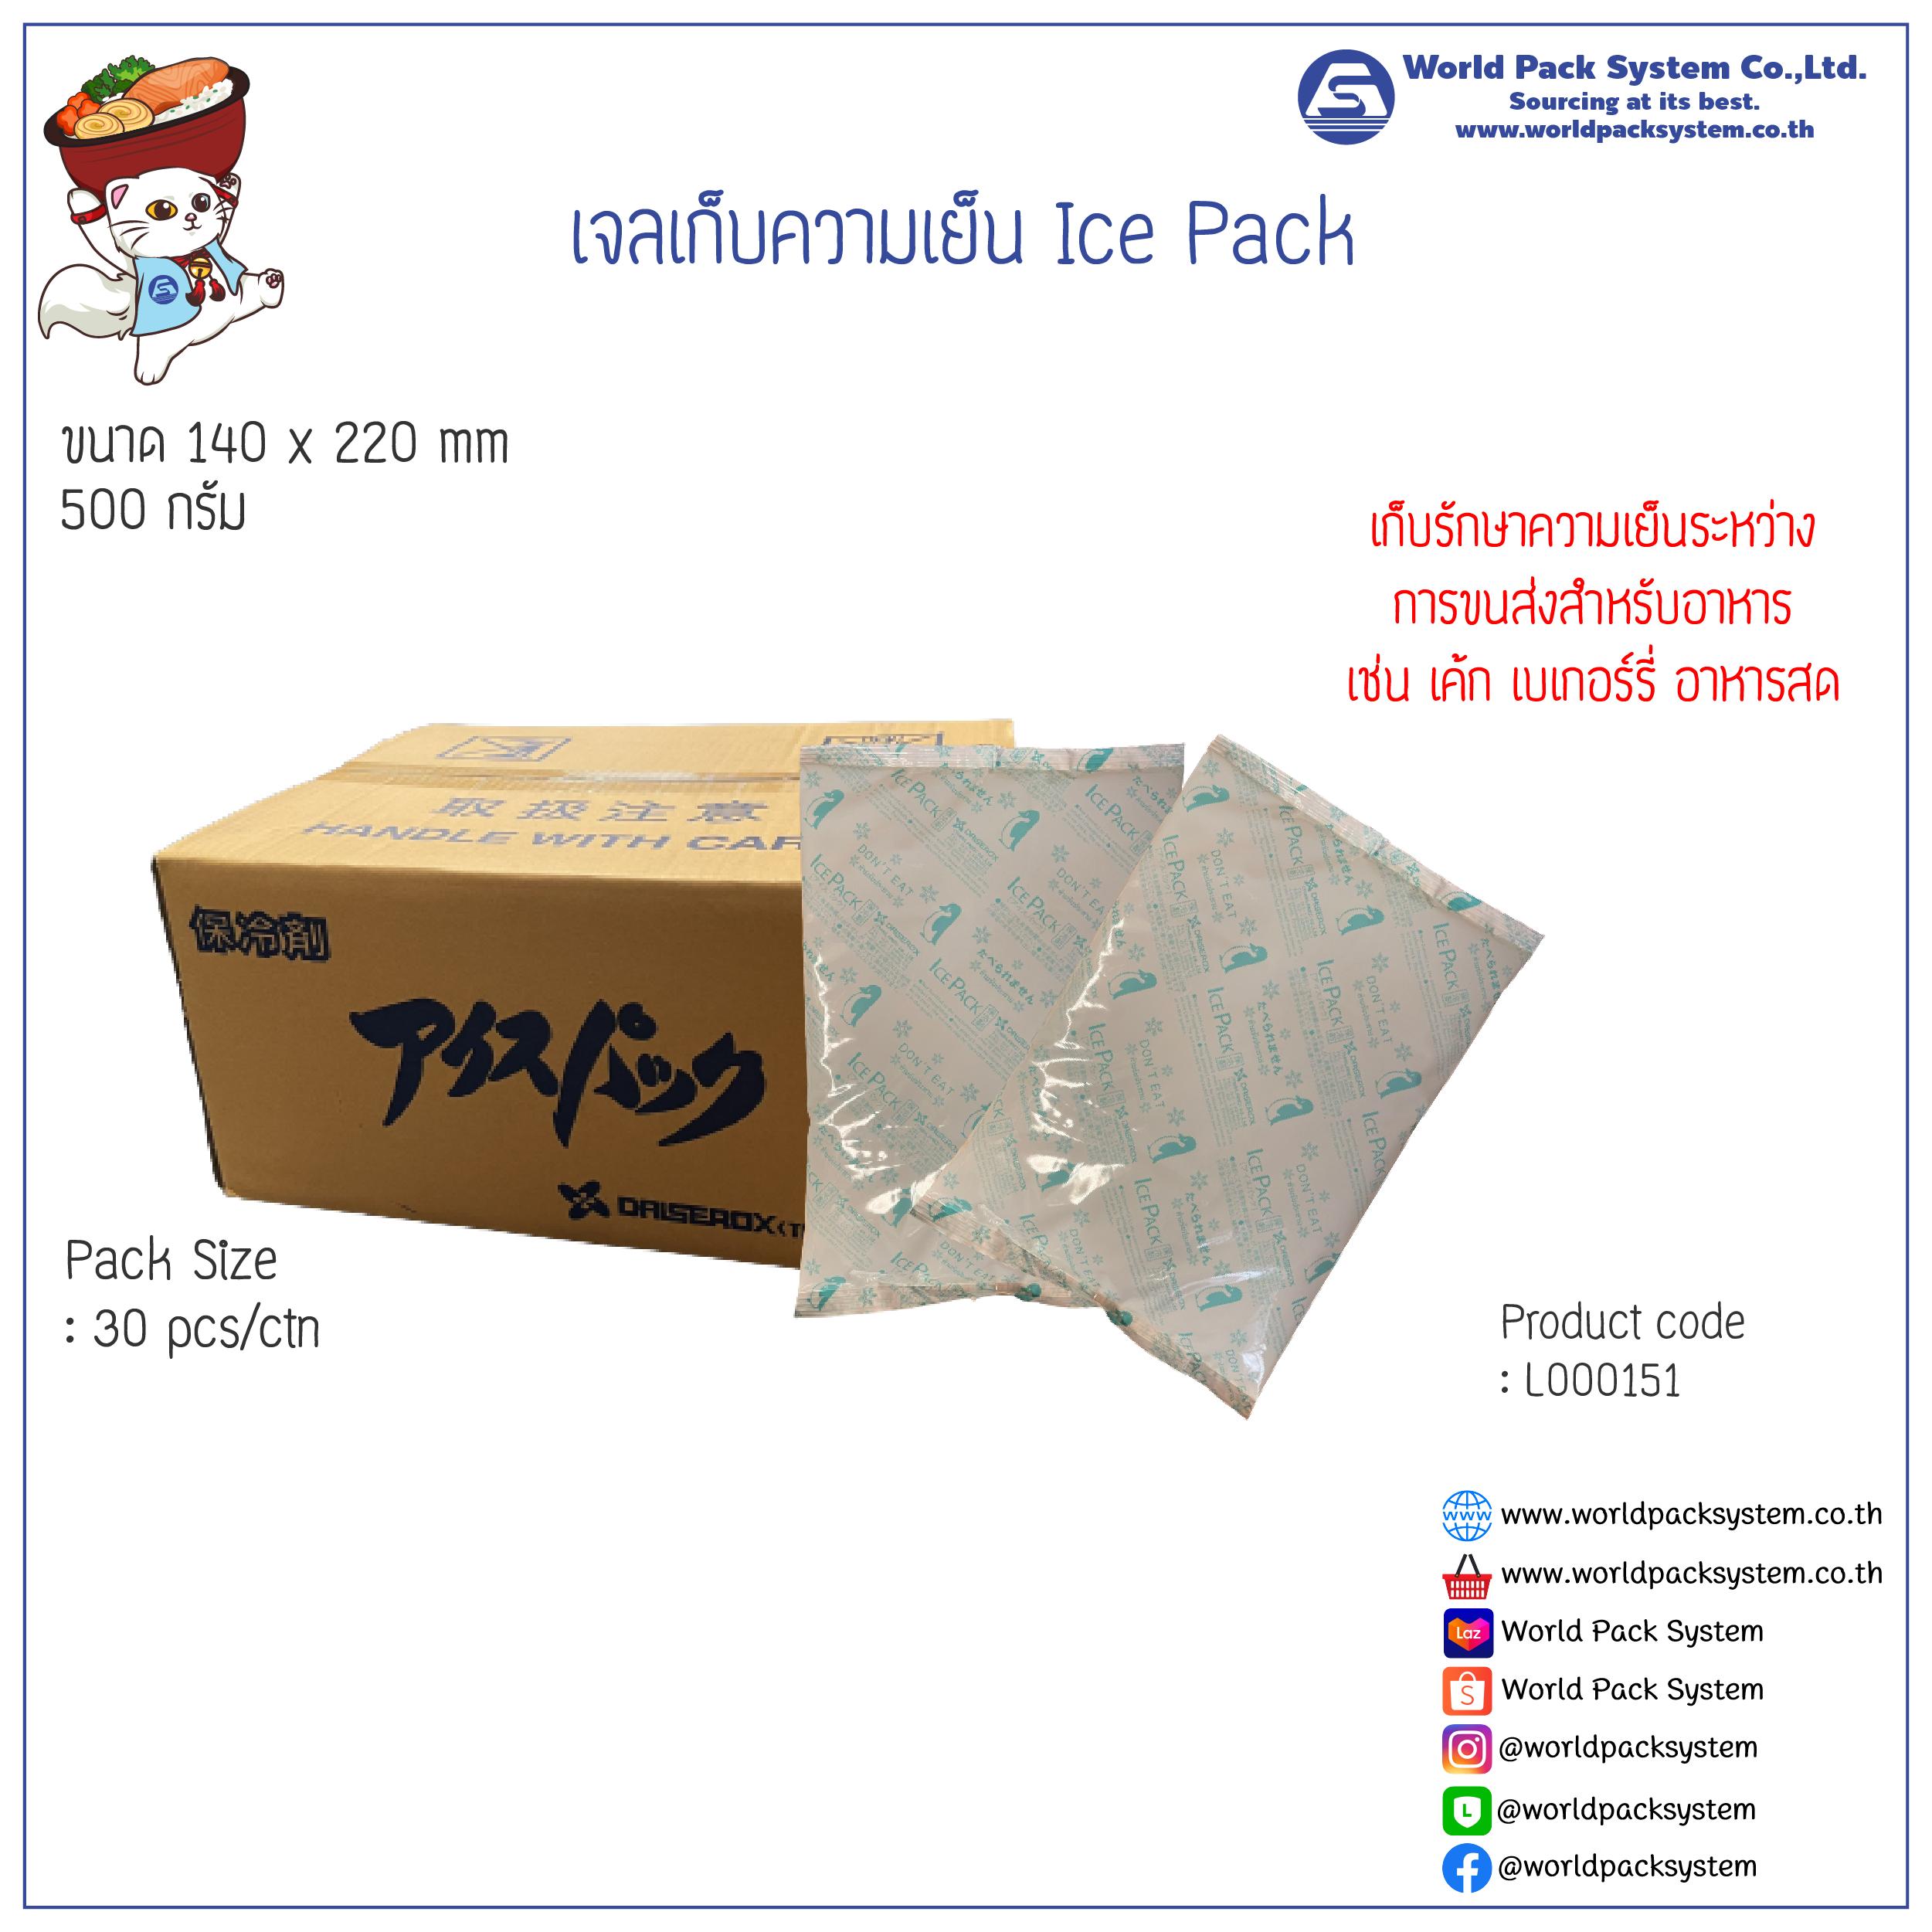 Ice Pack Size 500 g (30 pcs/ctn)